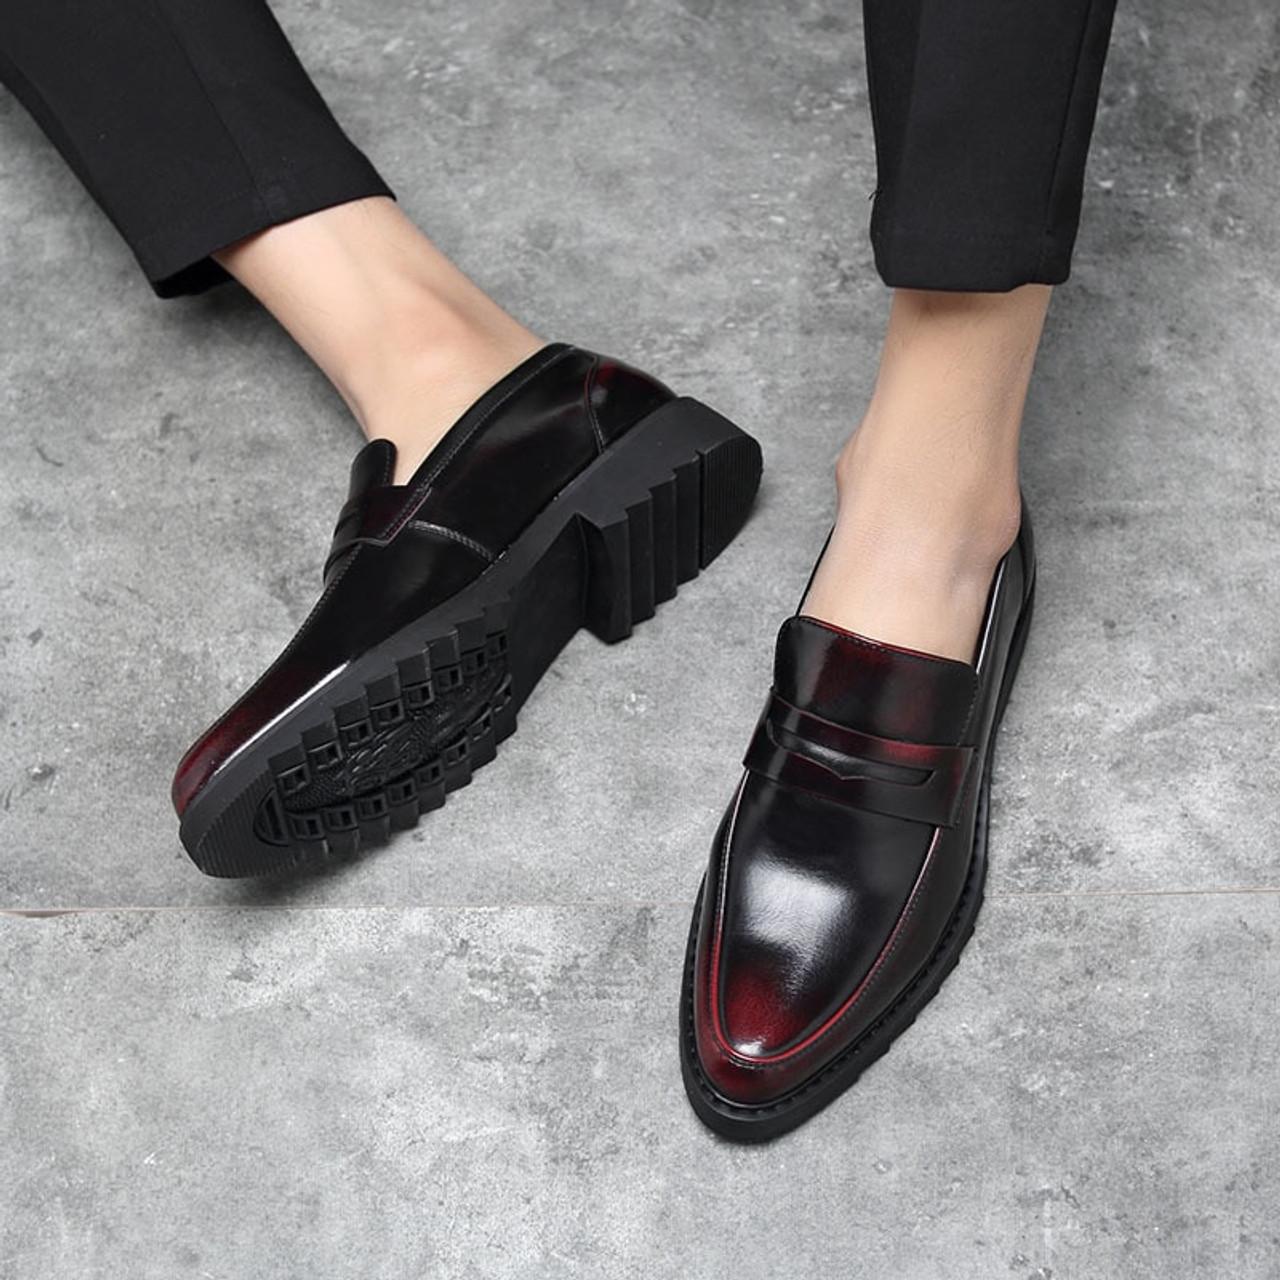 91ebf17dcef ... office patent leather shoes men brand business platform shoes oxford  shoes for men formal wedding dress ...